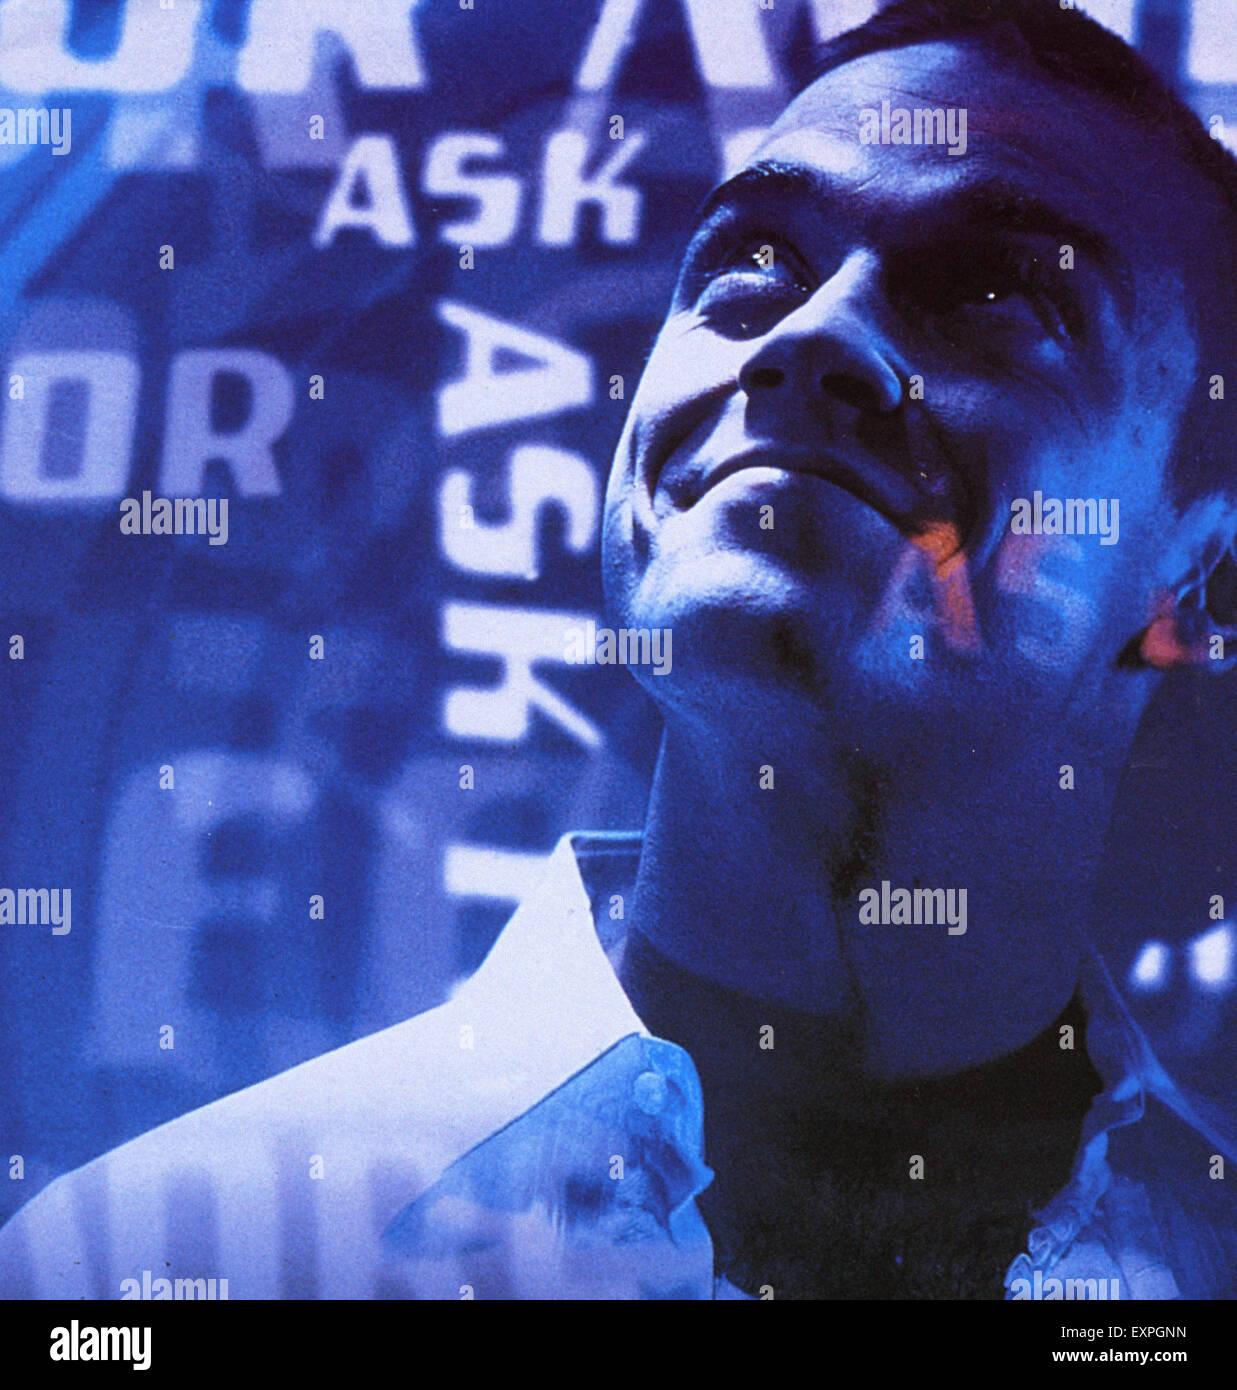 2000s UK Pepsi Promotional - Stock Image